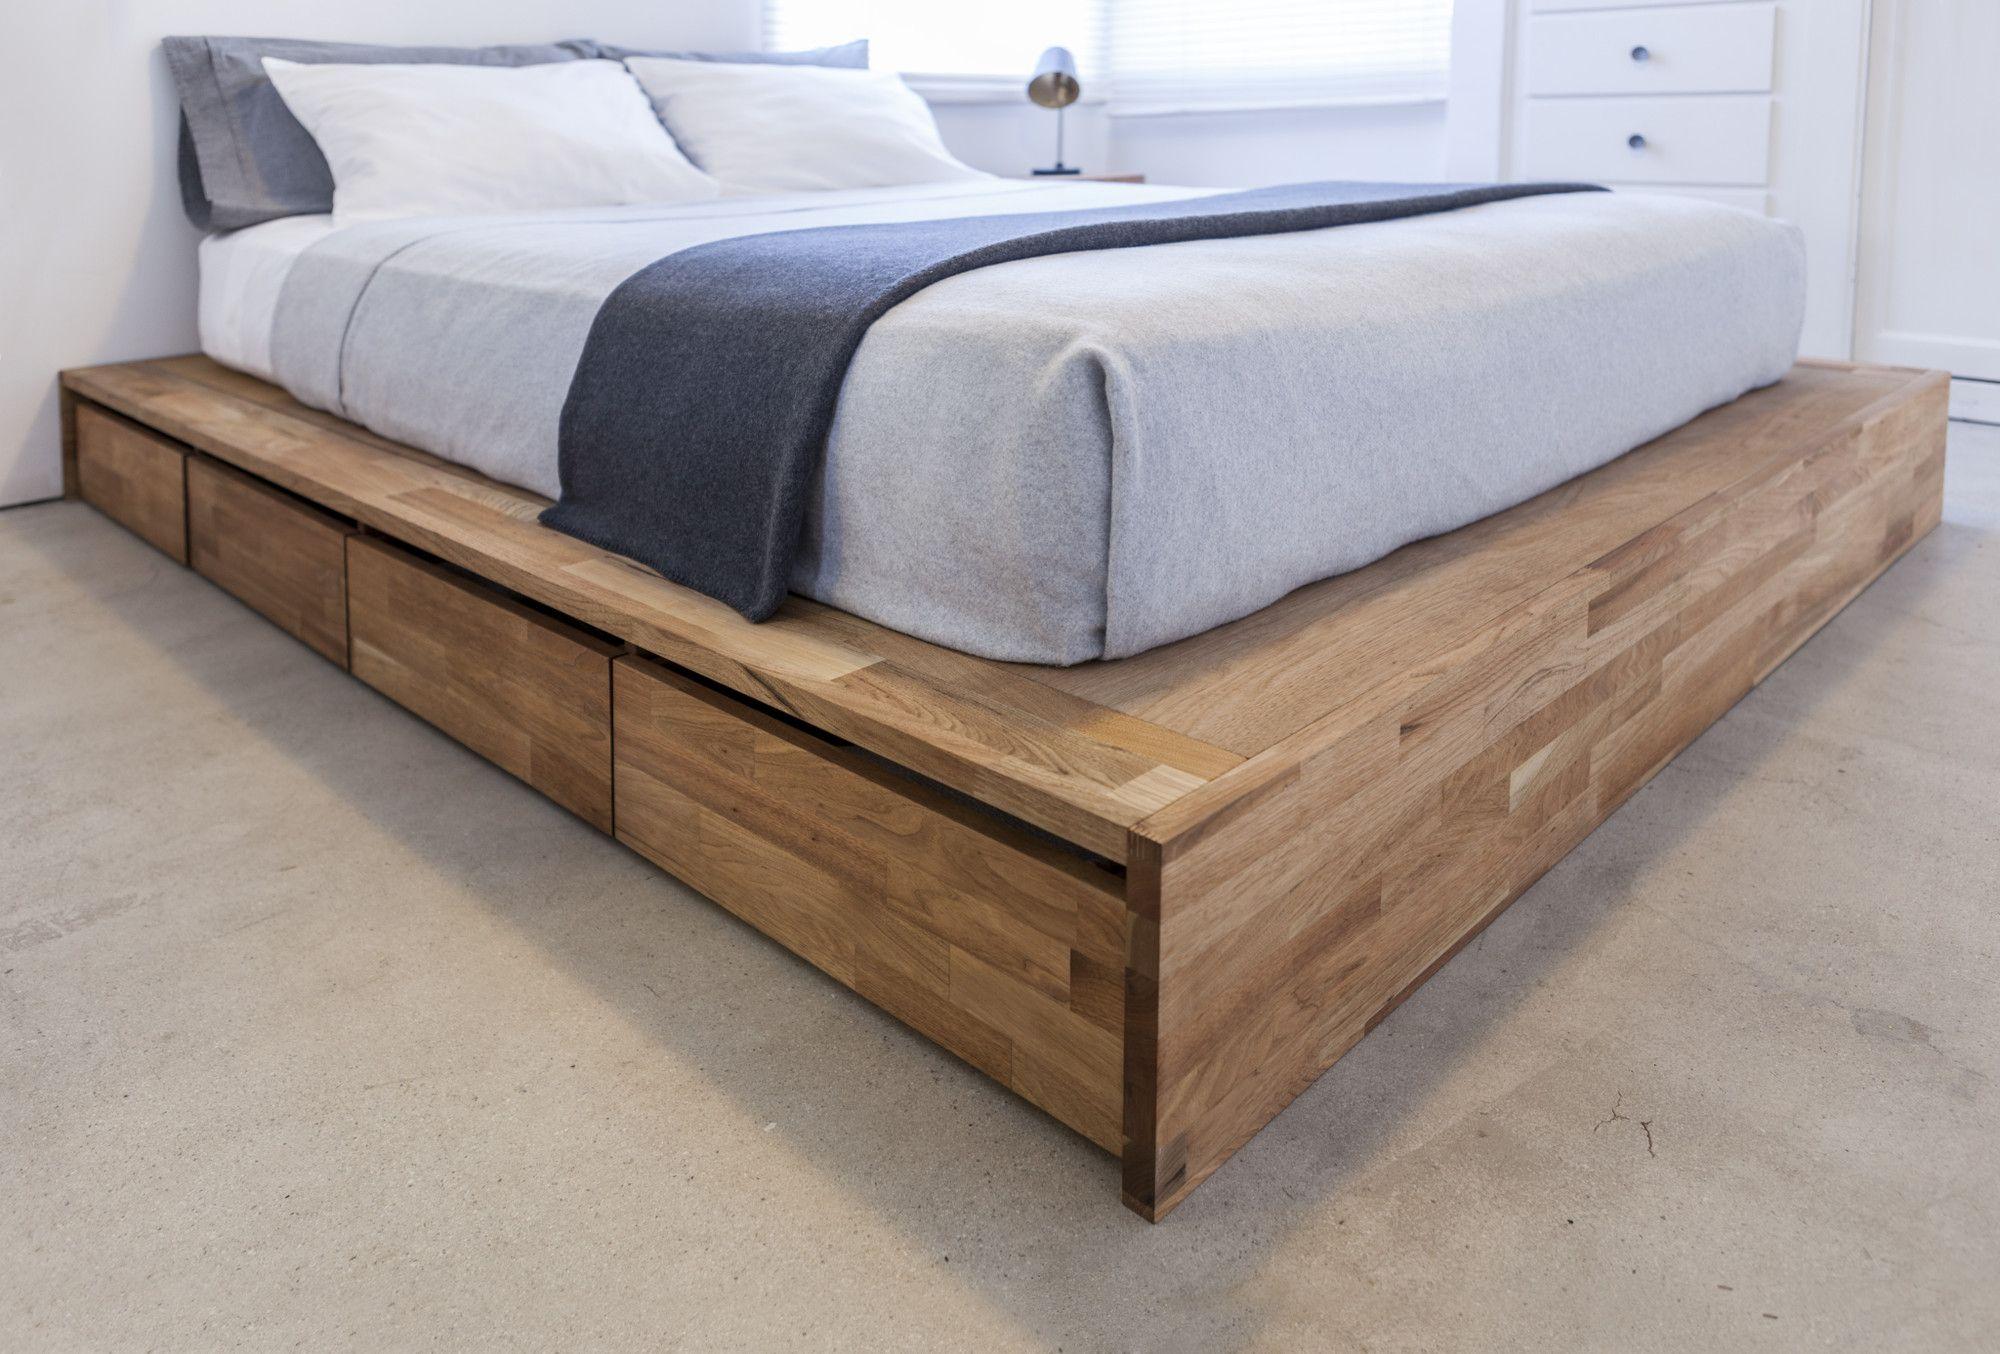 Lax Series Platform Bed lax series storage platform bed | diy platform bed, platform